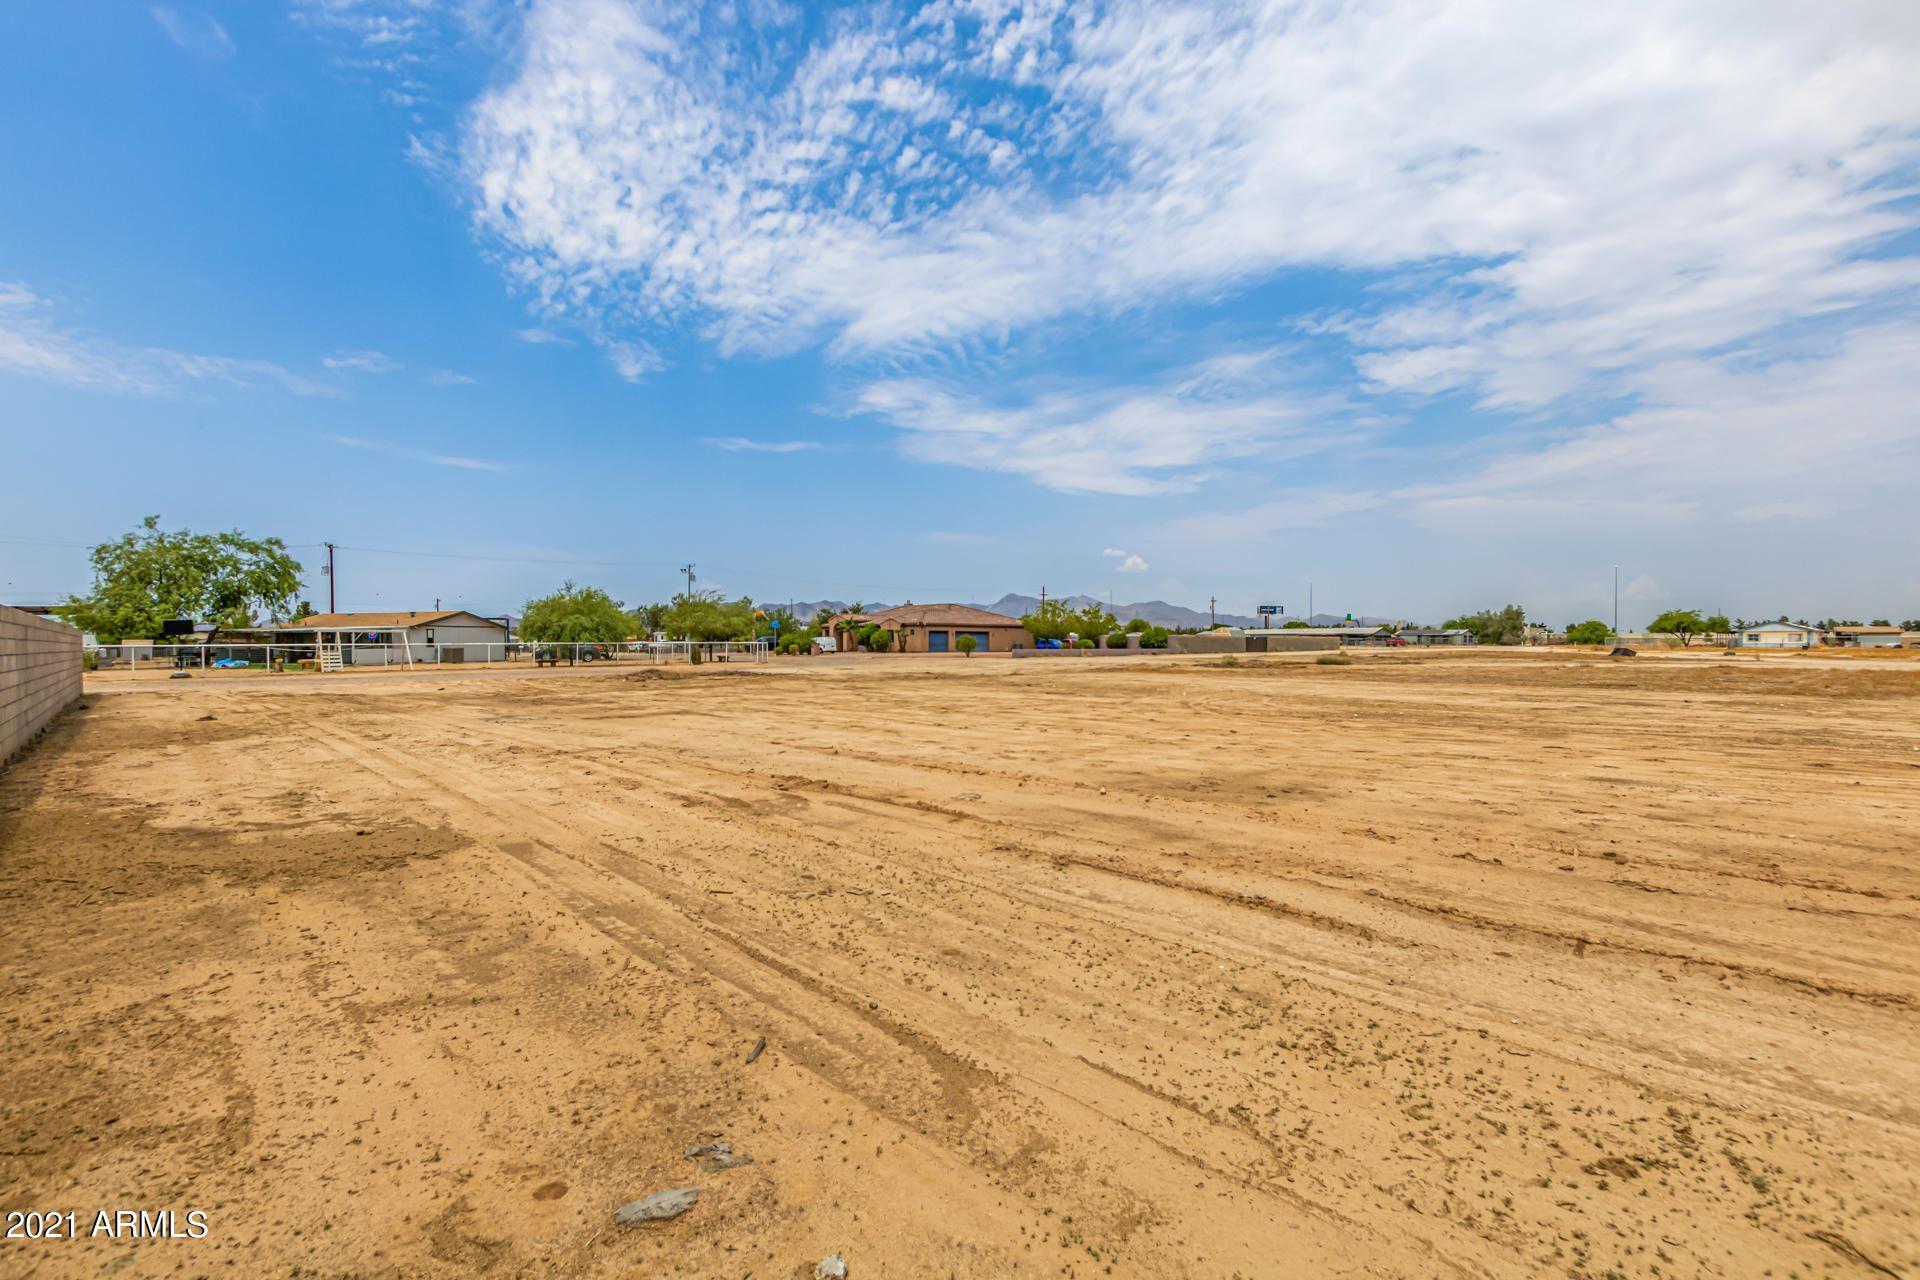 Photo of 0 N 183rd Avenue, Goodyear, AZ 85338 (MLS # 6269332)